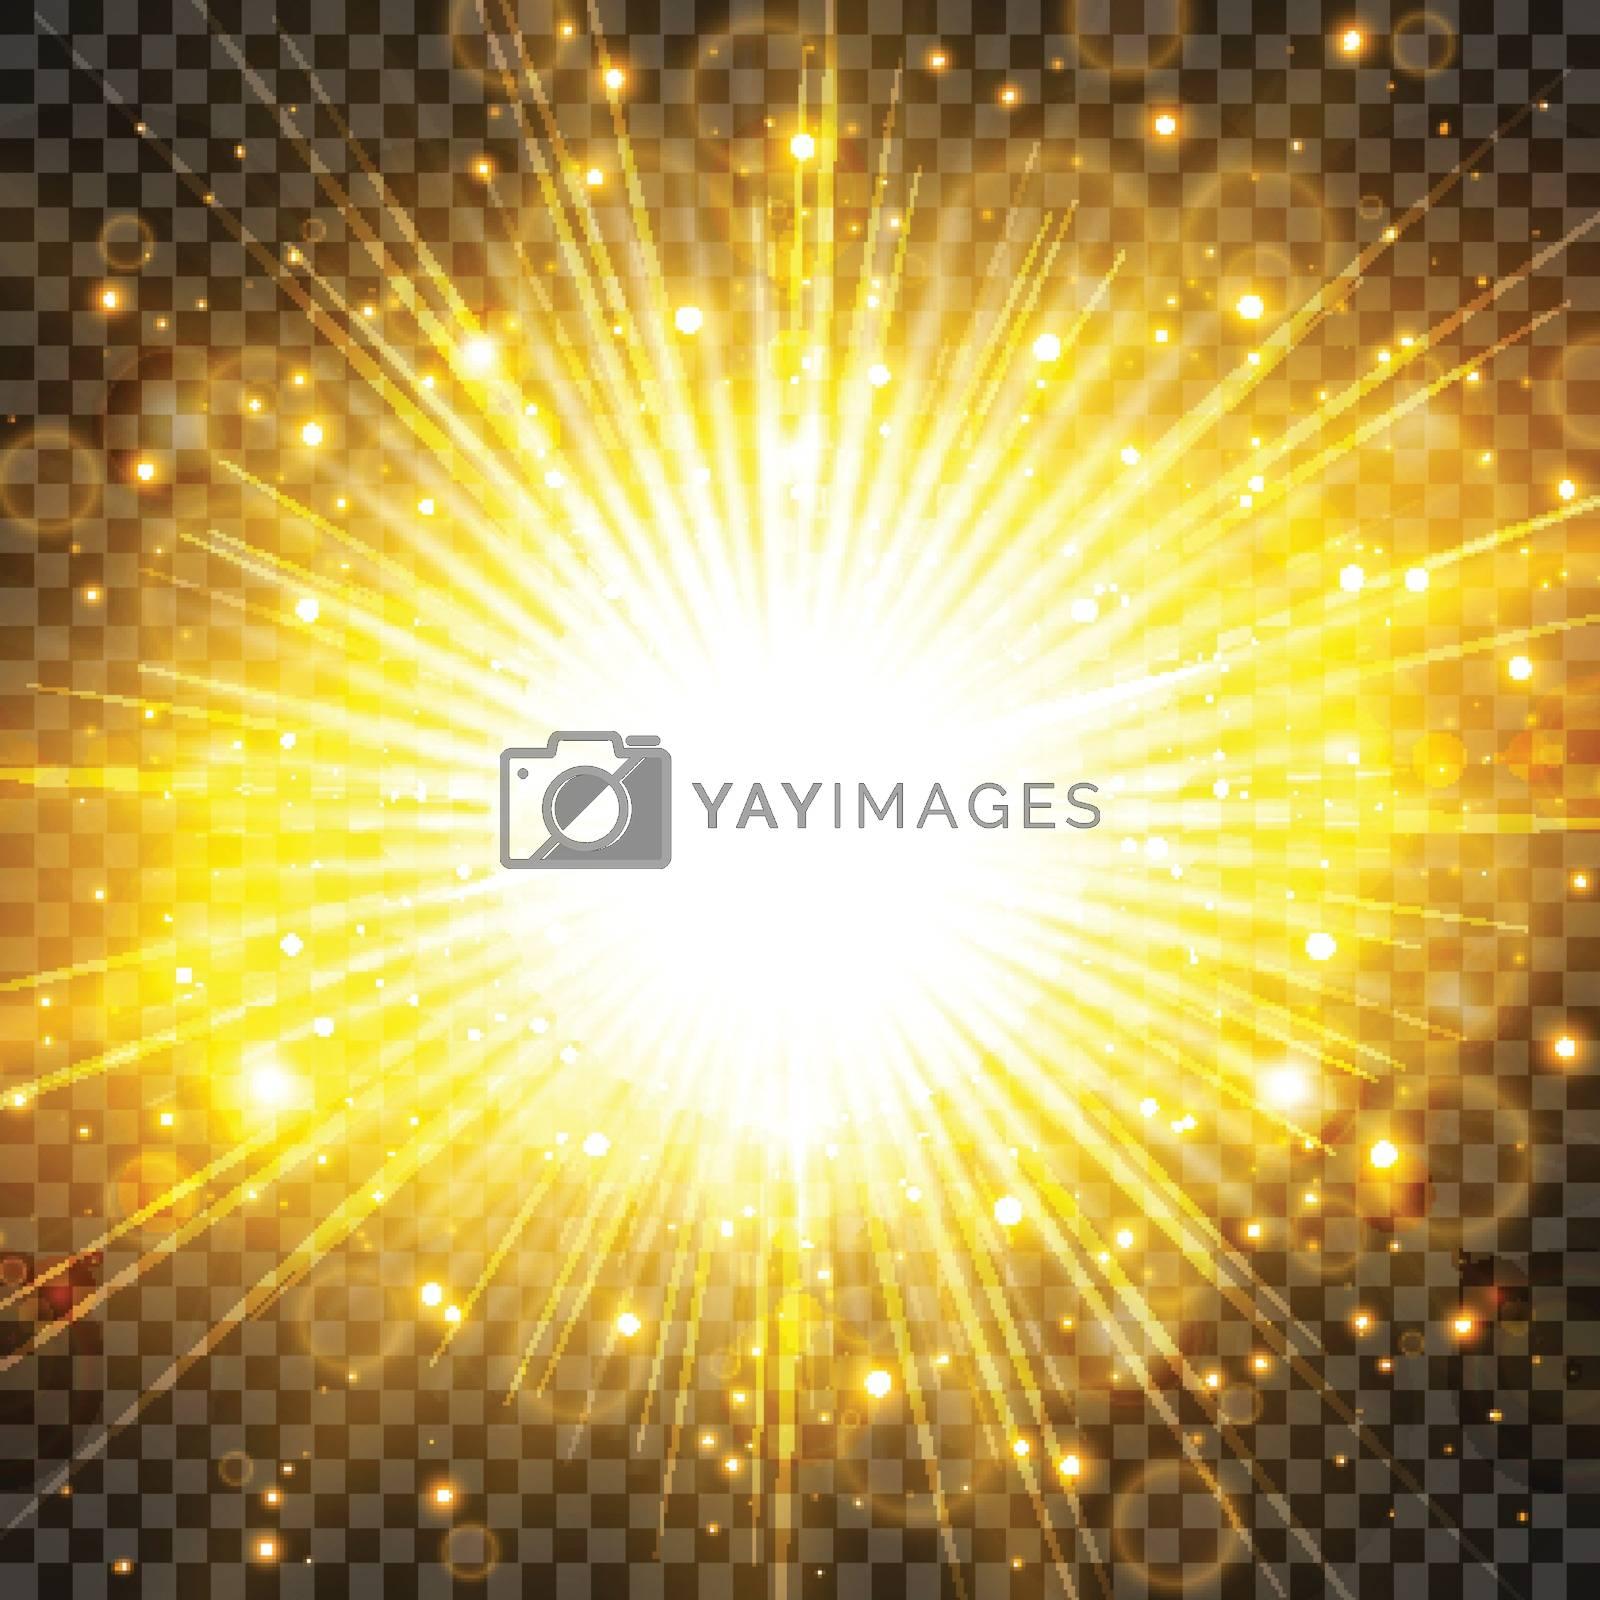 Sun light and sunburst with glittering on transparency background. Lighting effect radiation. Vector illustration